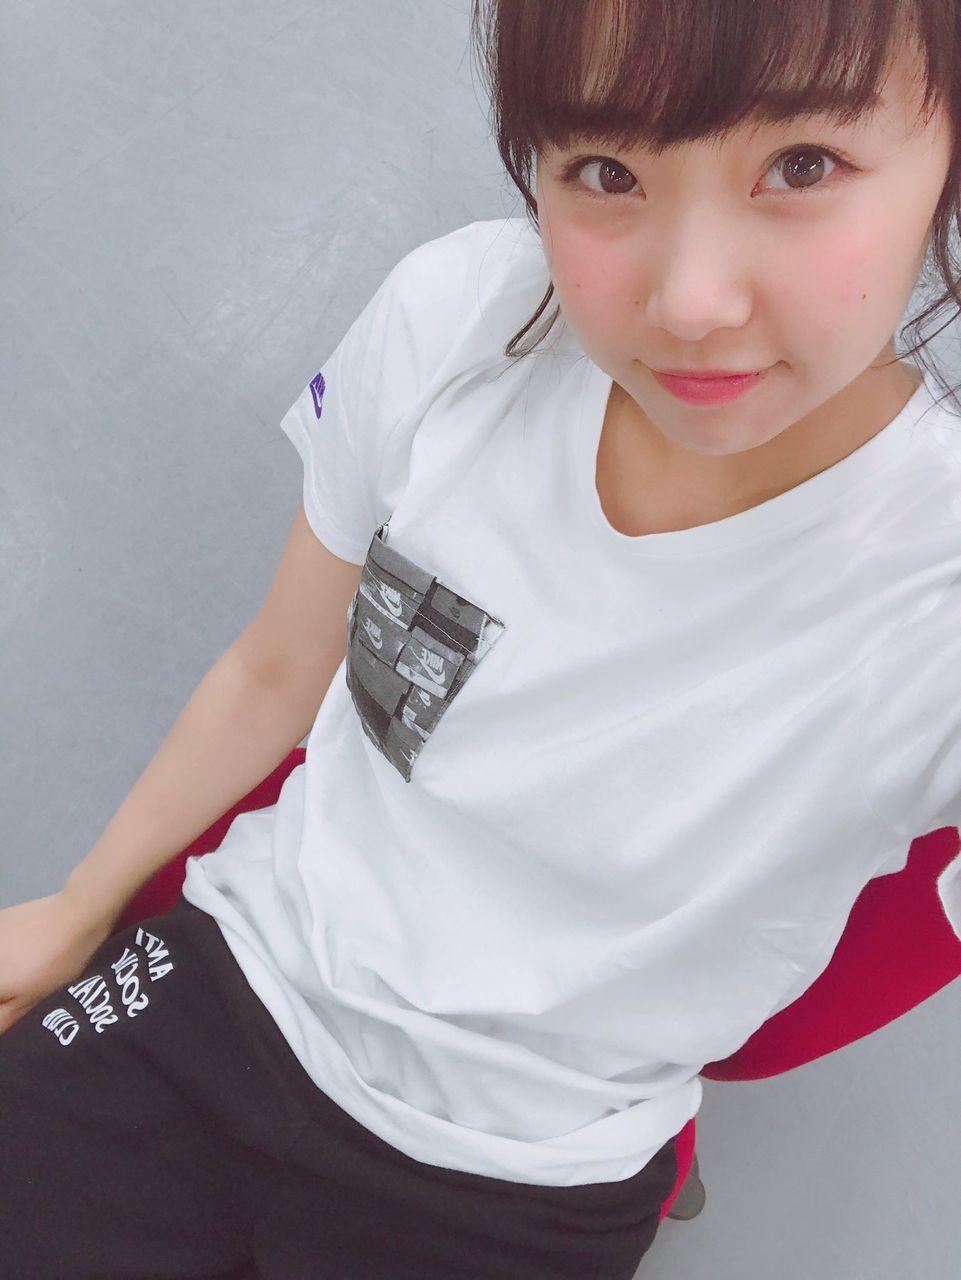 【SHOWROOM】うーかのうーかが暴れまくりで東京タワー建設ラッシュwwwwwww【NMB48加藤夕夏】